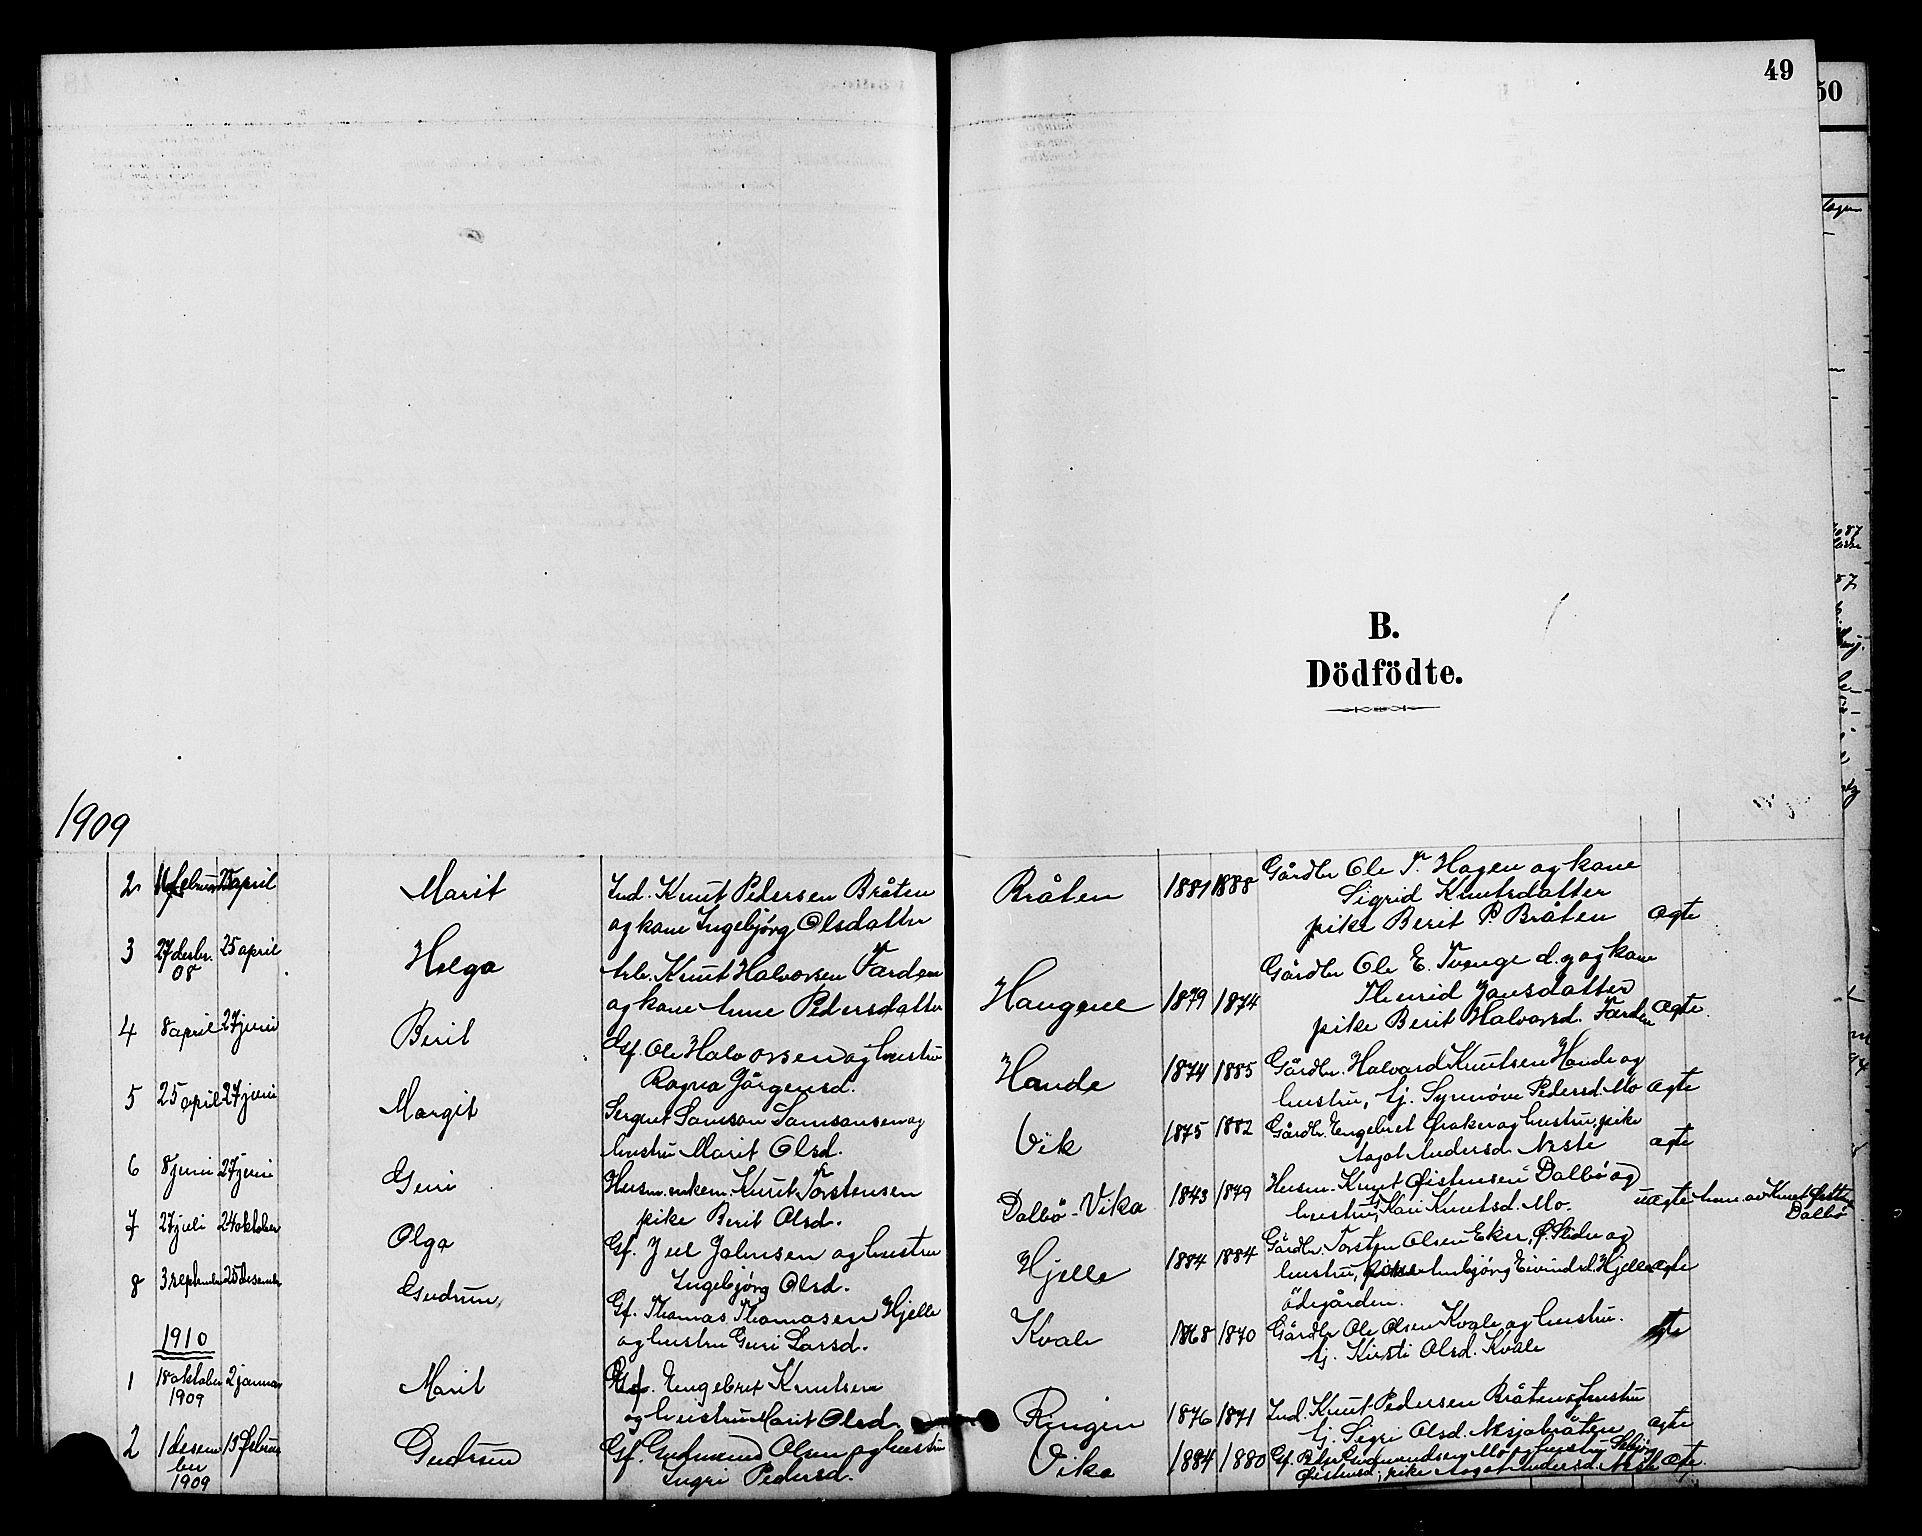 SAH, Vestre Slidre prestekontor, Klokkerbok nr. 4, 1881-1912, s. 49